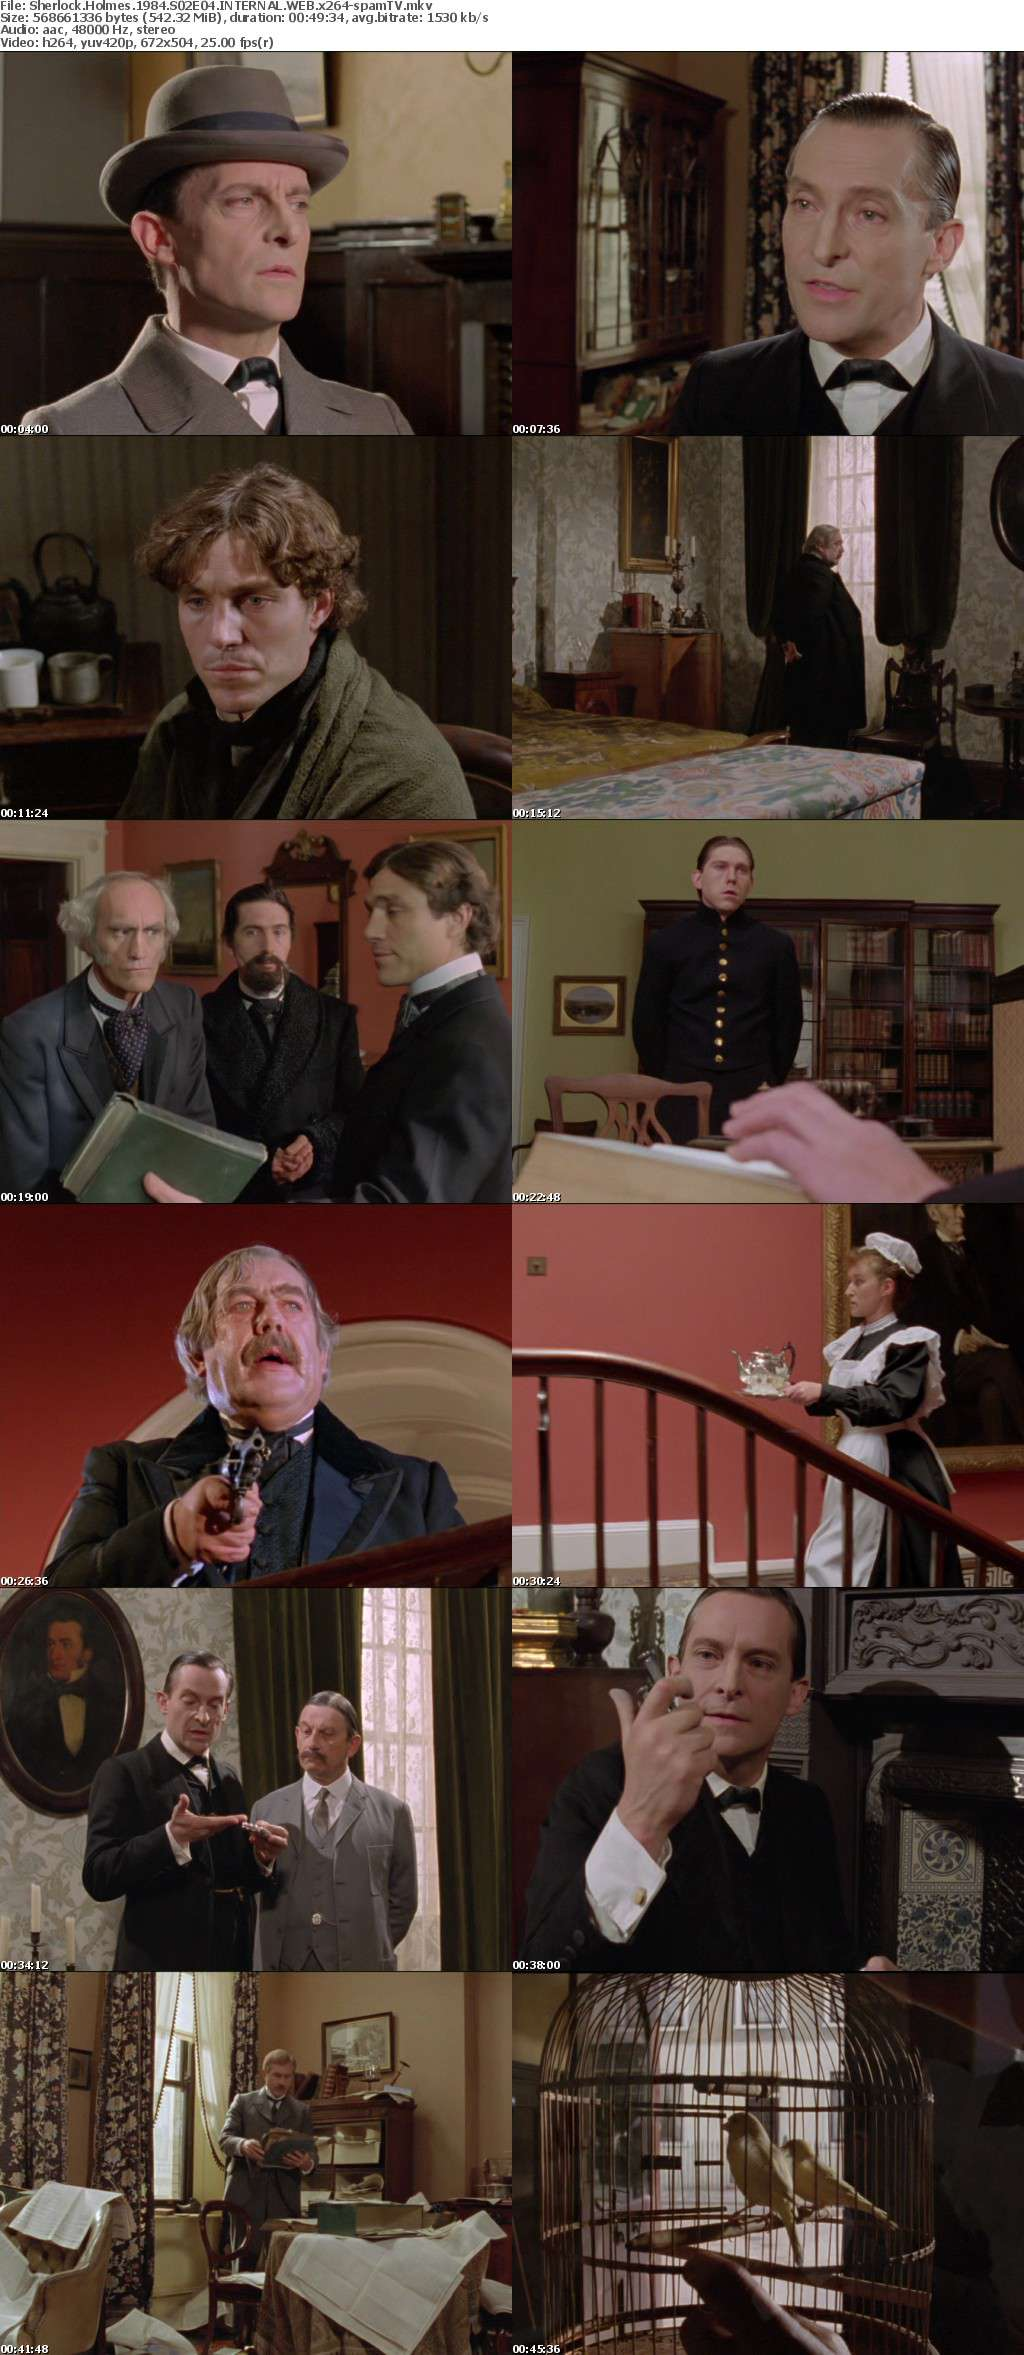 Sherlock Holmes 1984 S02E04 INTERNAL WEB x264-spamTV